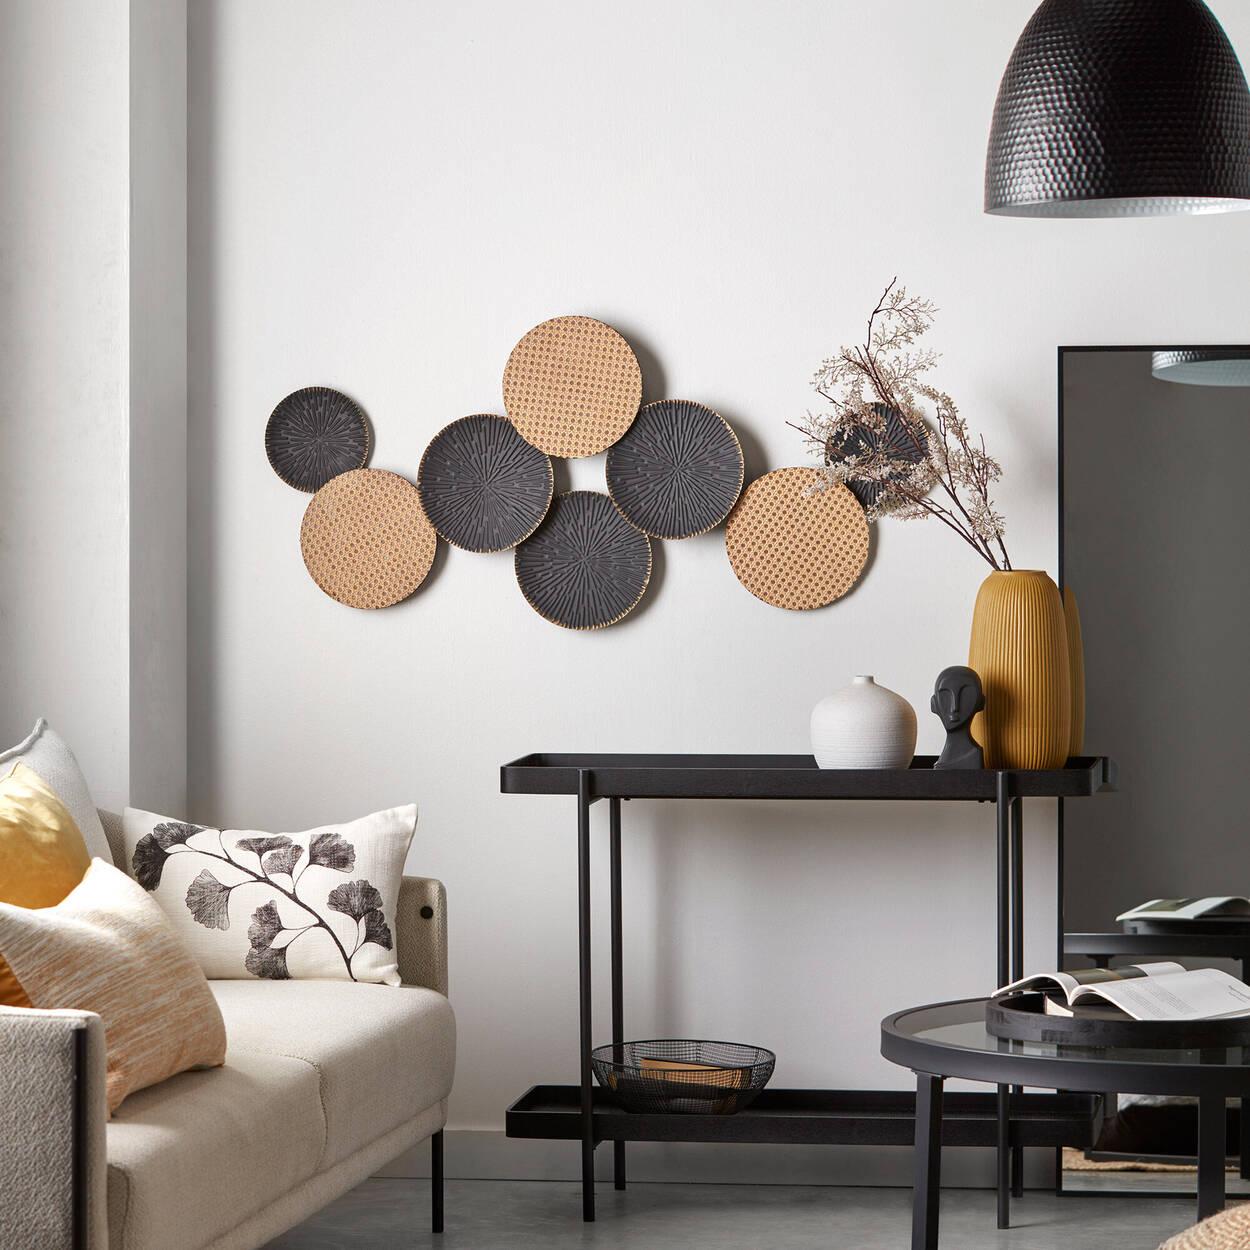 Art mural cercles en cannage métallique